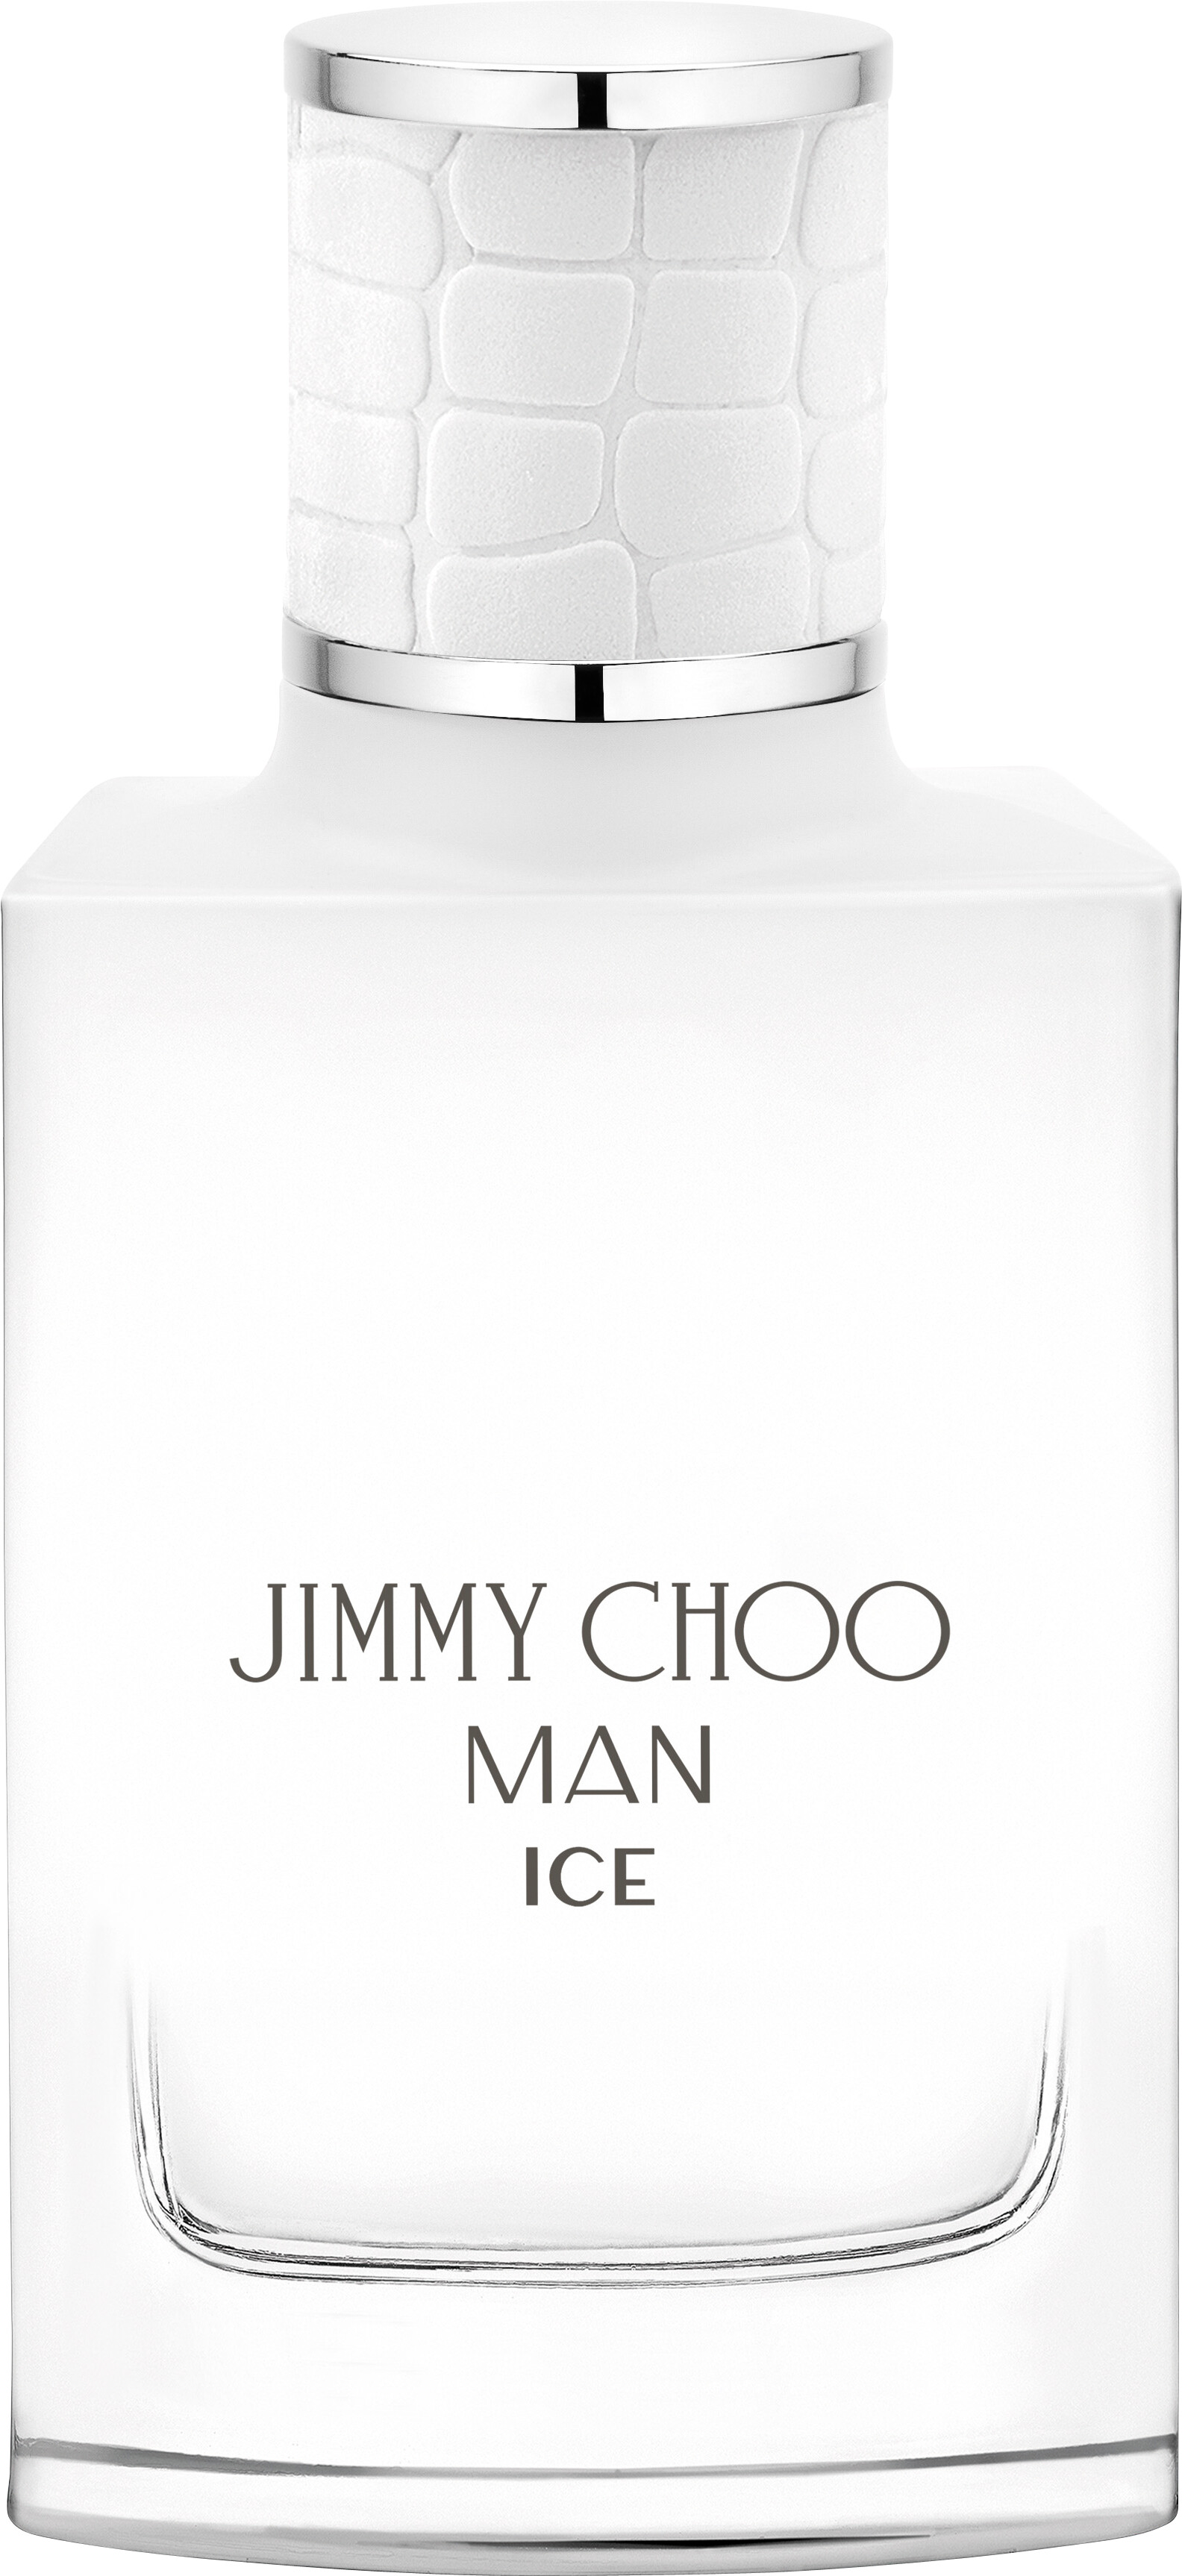 d0caf1203d12 ... Jimmy Choo Man Ice Eau de Toilette Spray 30ml ...